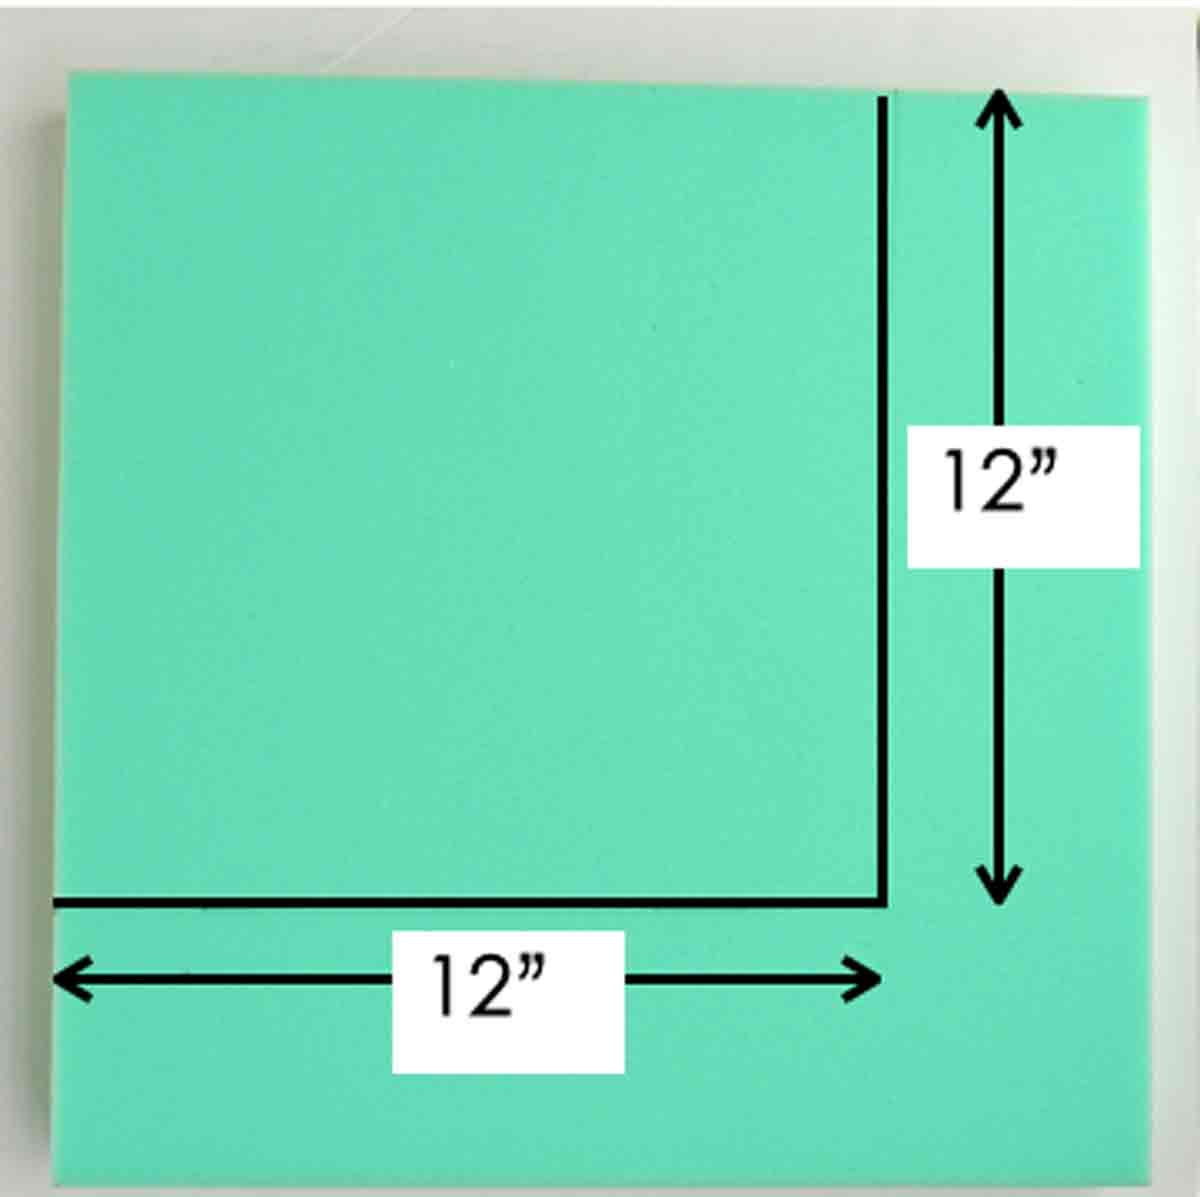 How to Measure Foam to make square bar stool cushions